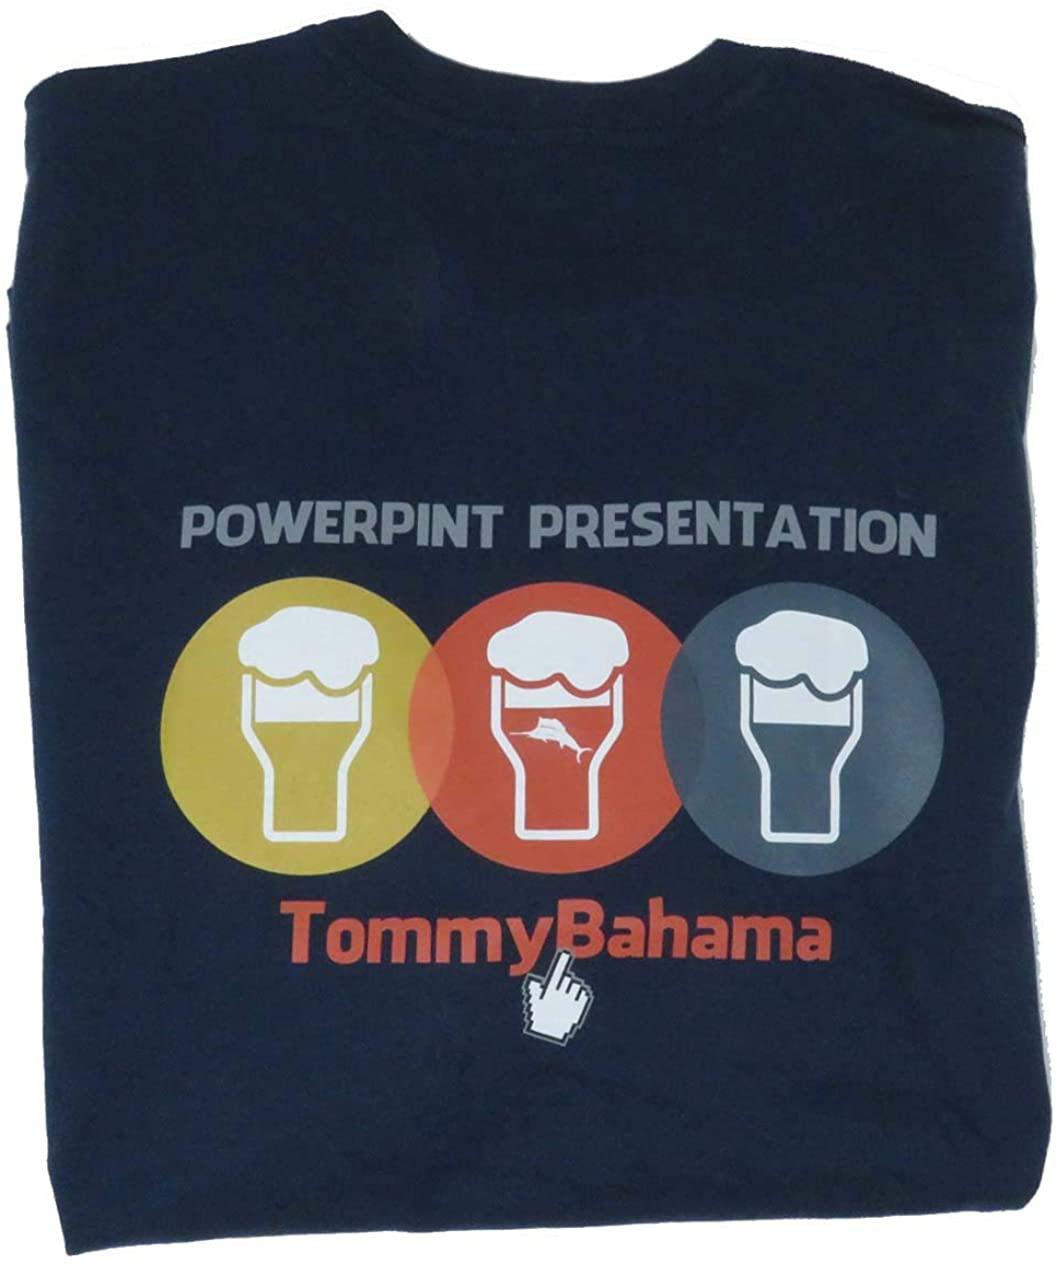 Tommy Bahama Powerpint Presentation X-Large Navy T Shirt